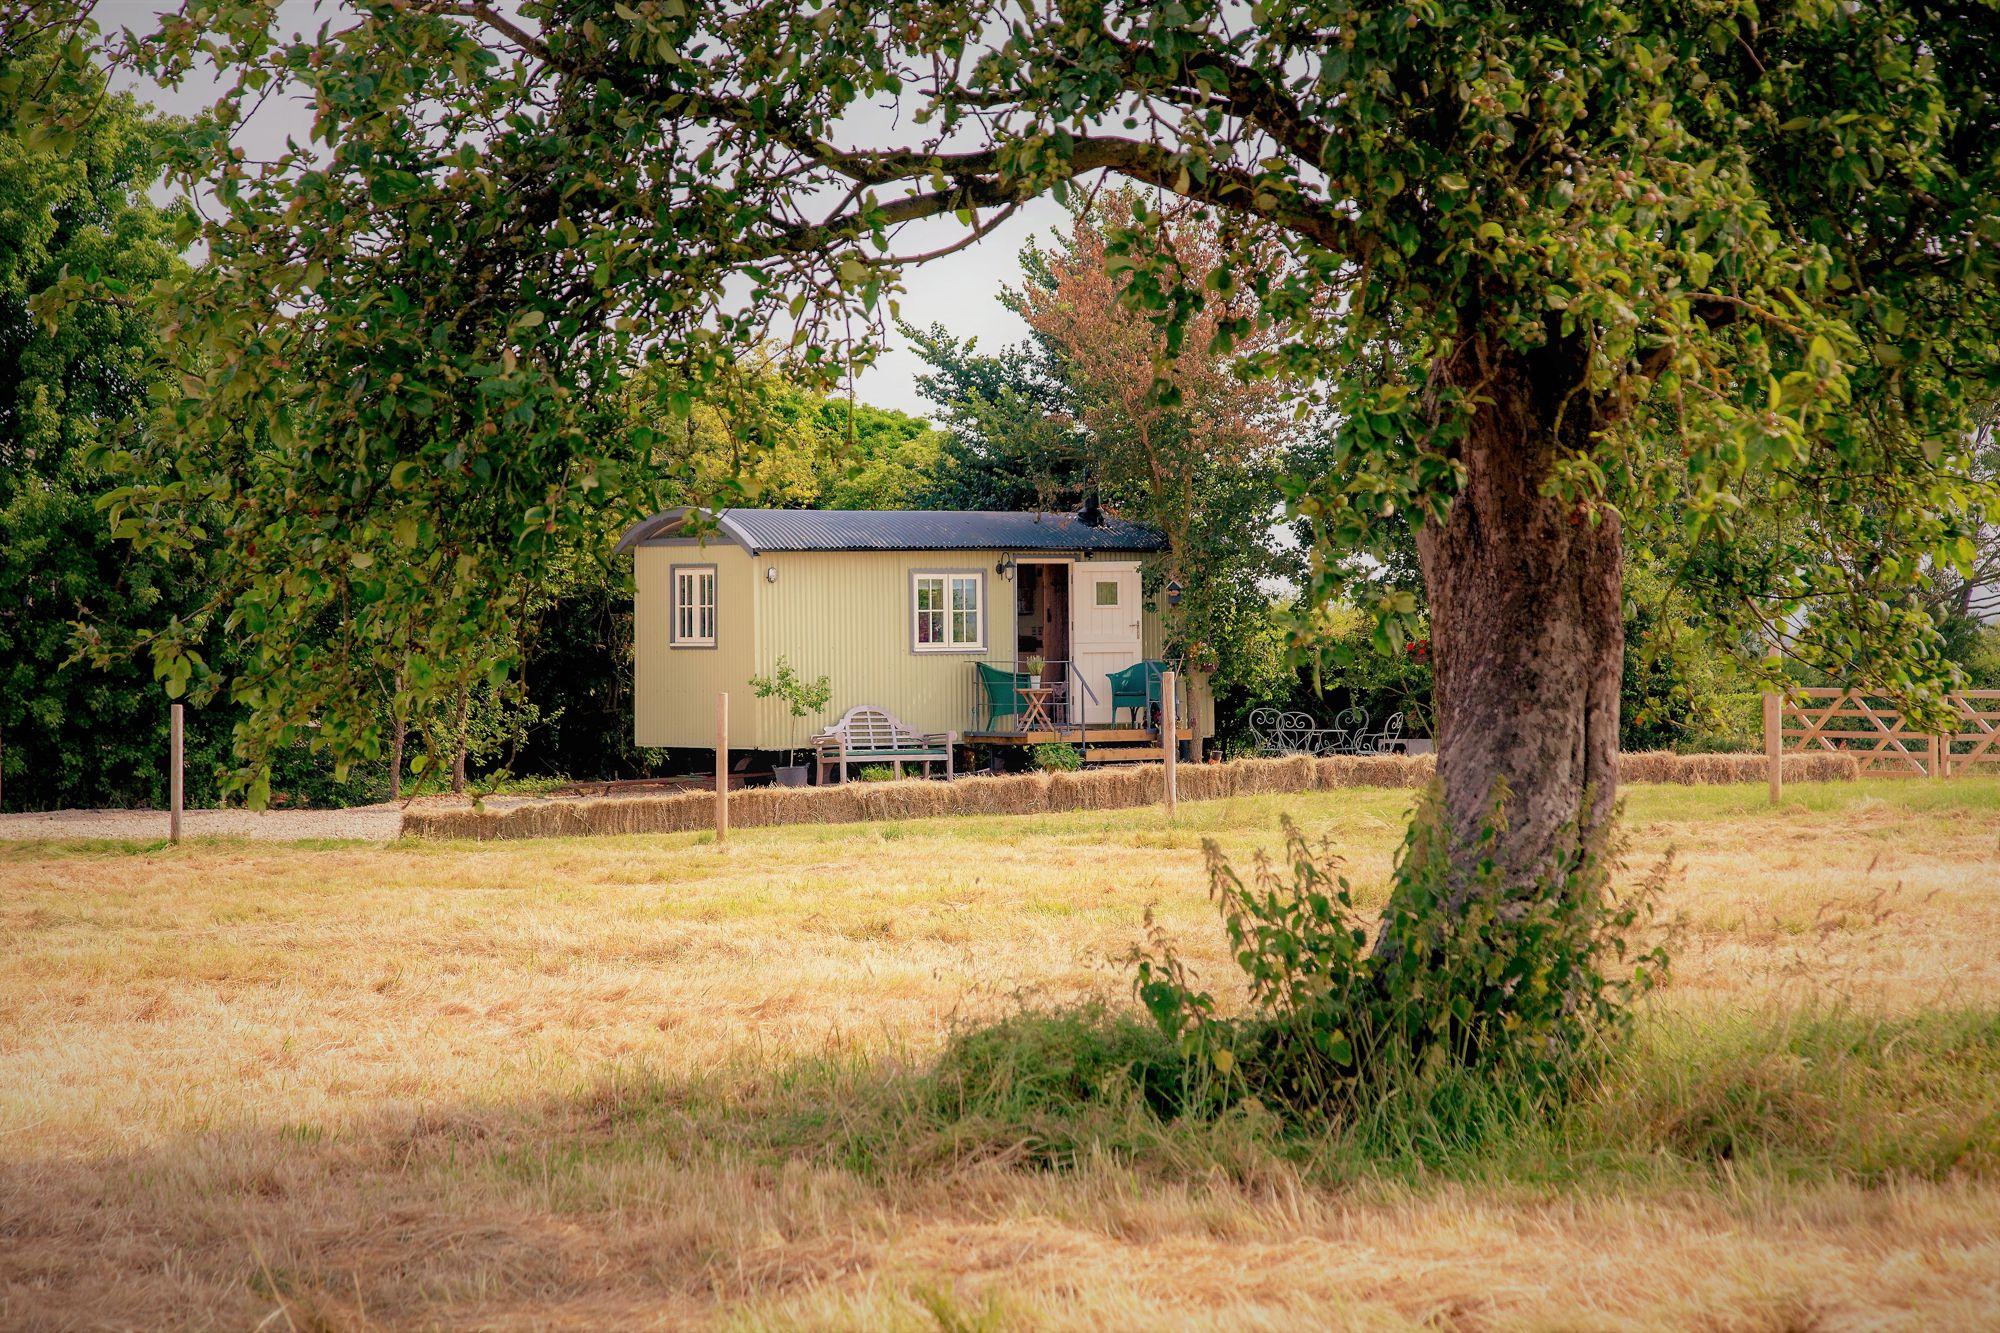 Abberton Shepherds Hut